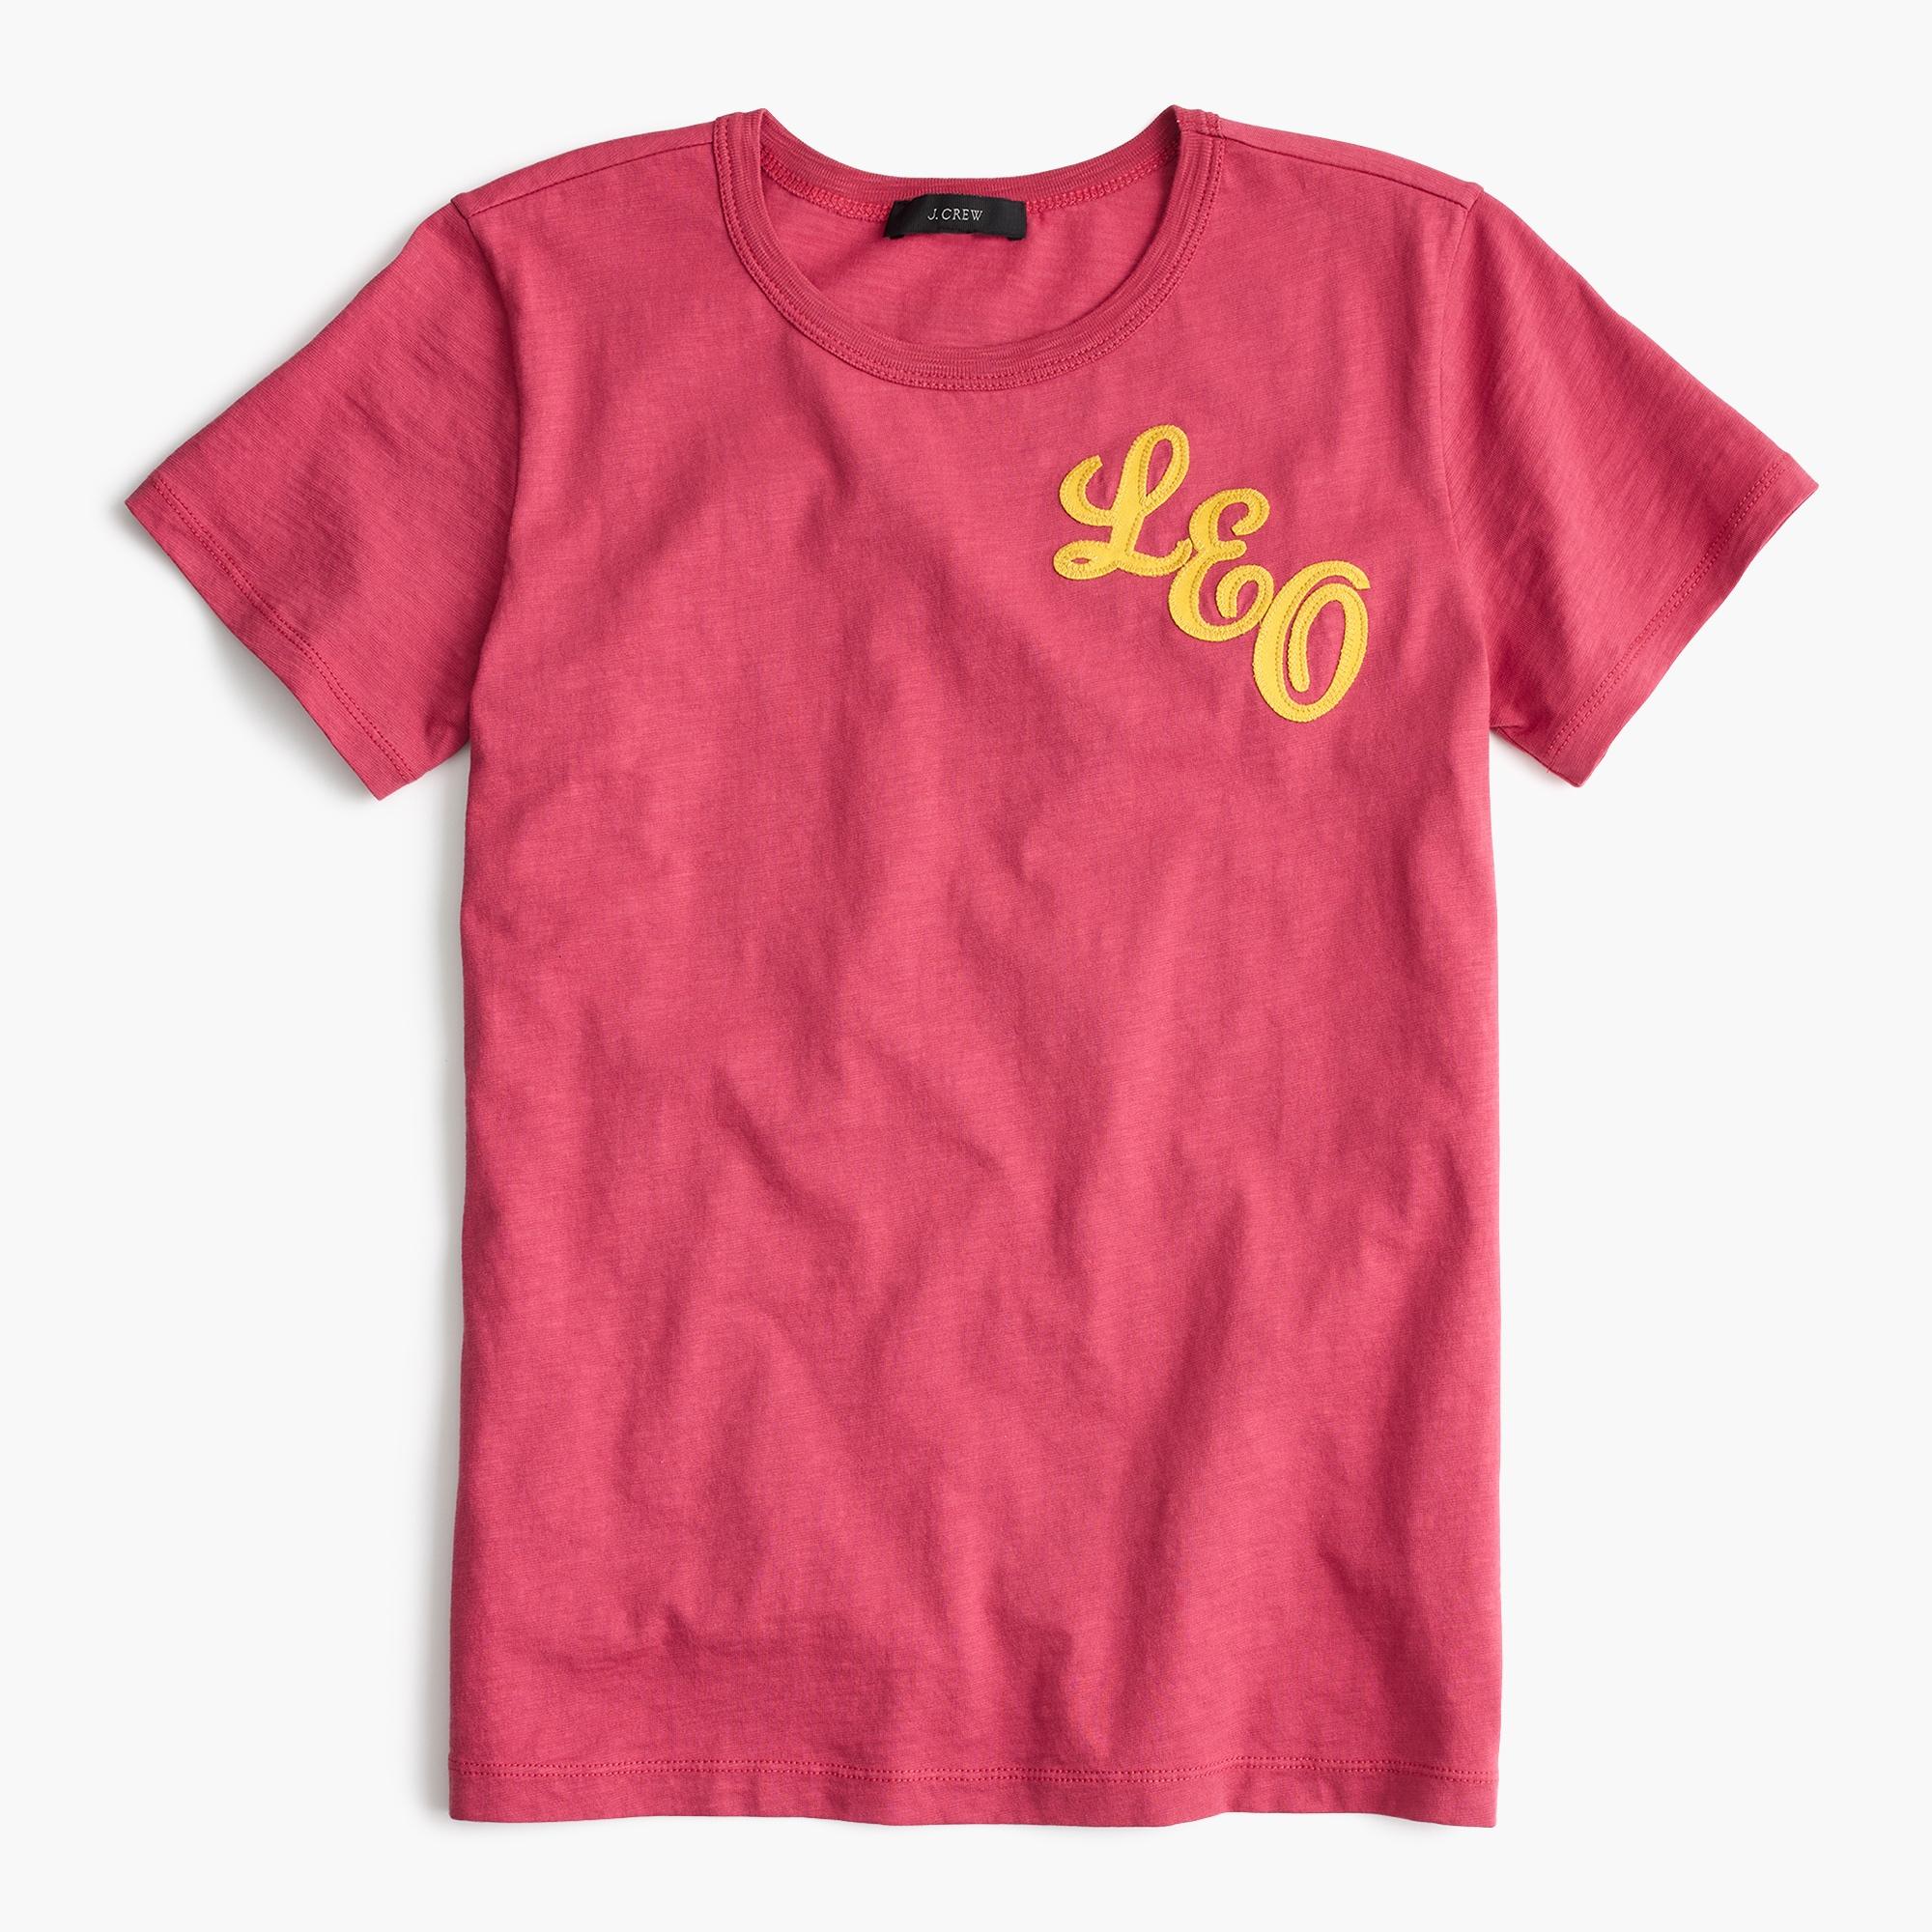 Leo, Zodiaco, Signo Zodiaco, Moda, Tendencias, Back-To-School